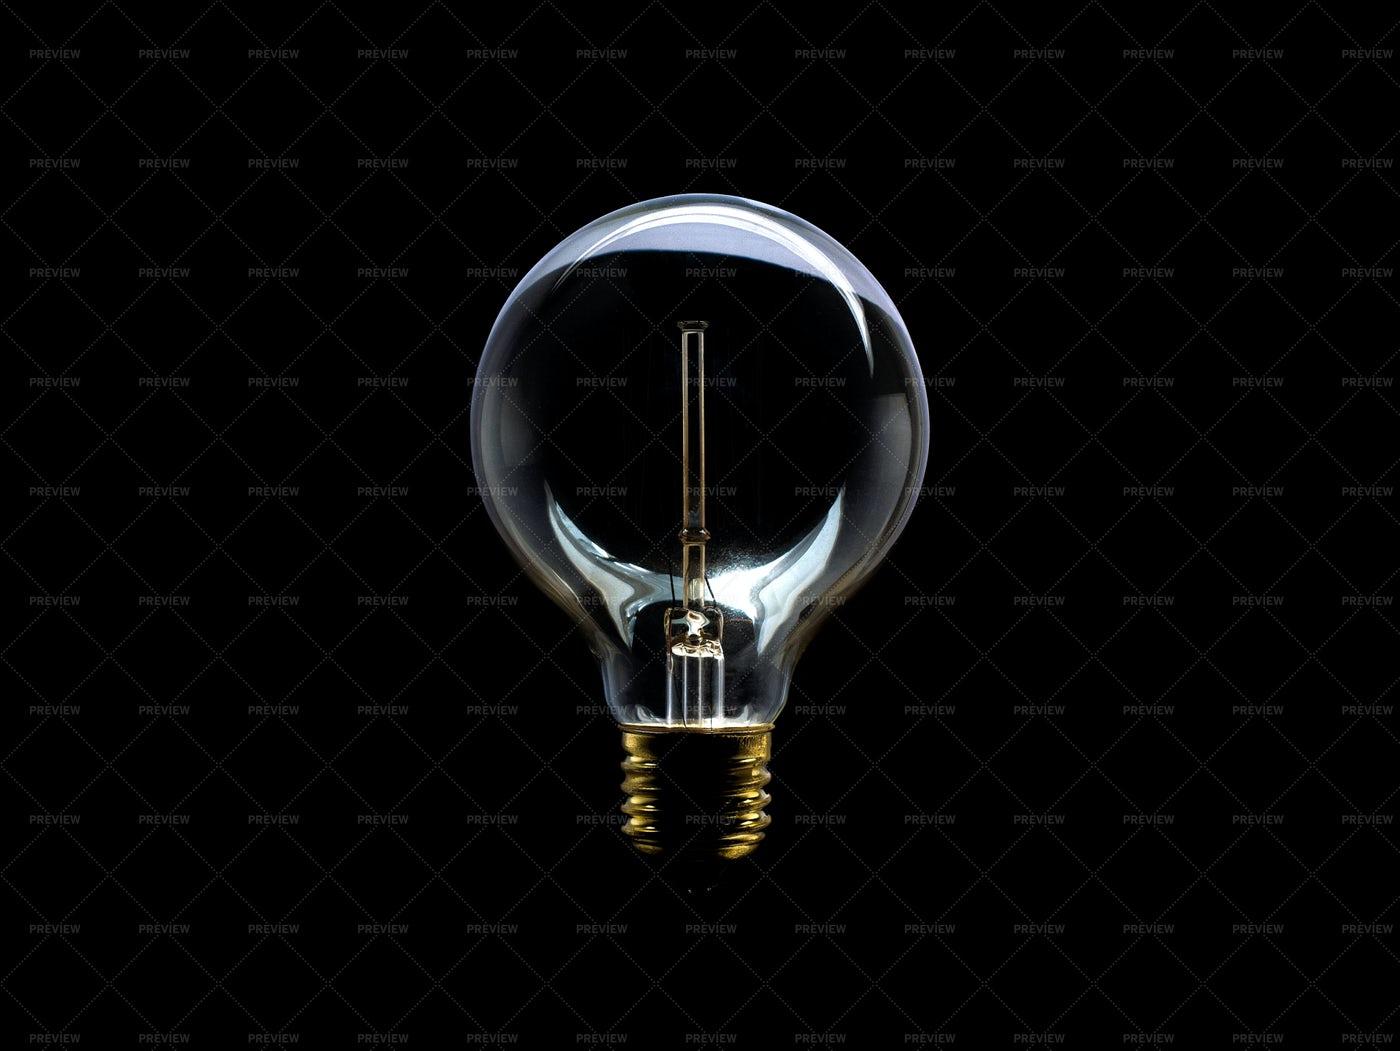 Incandescent Light Bulb Off: Stock Photos